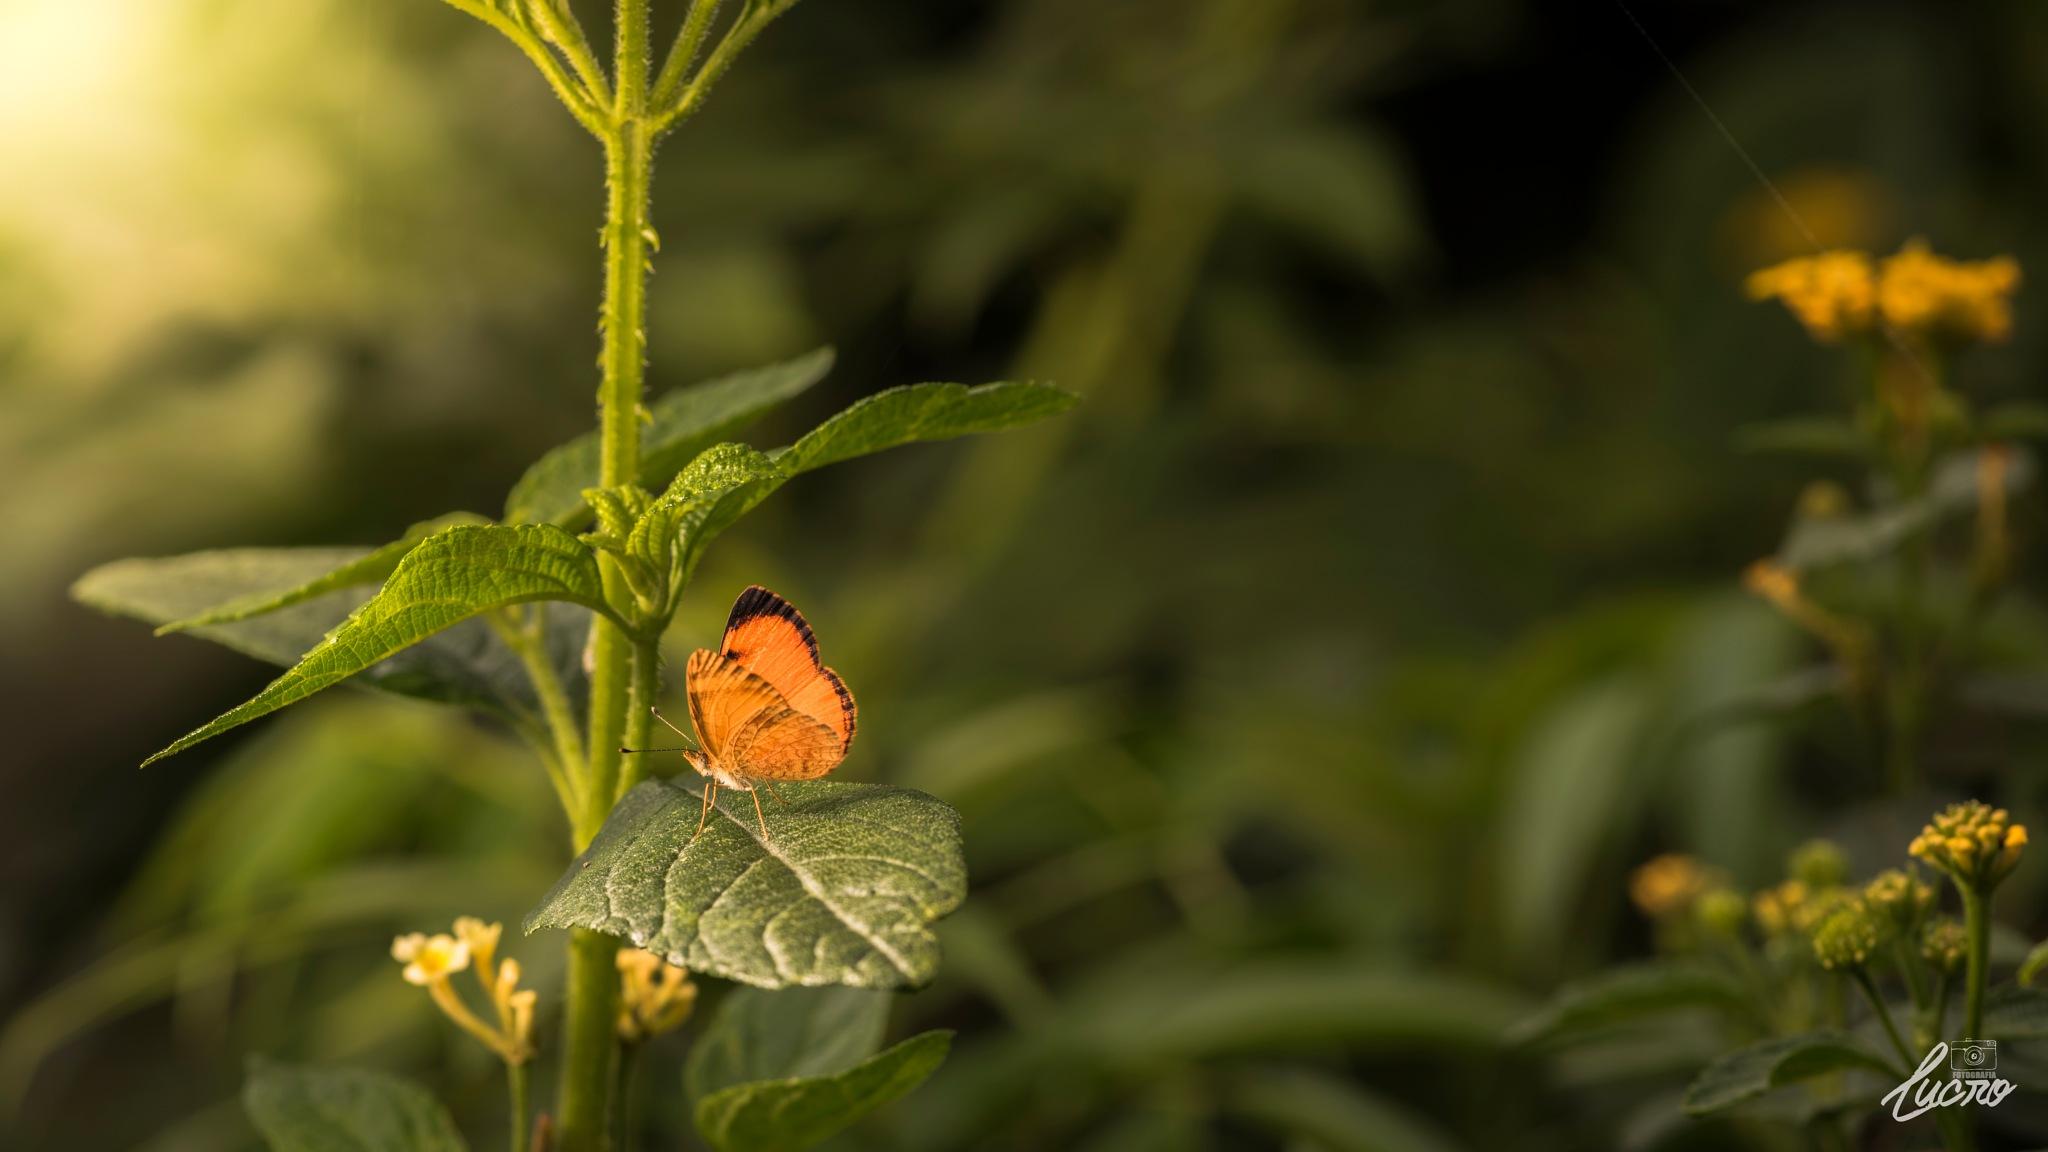 Magic Butterfly by LucroFotografia